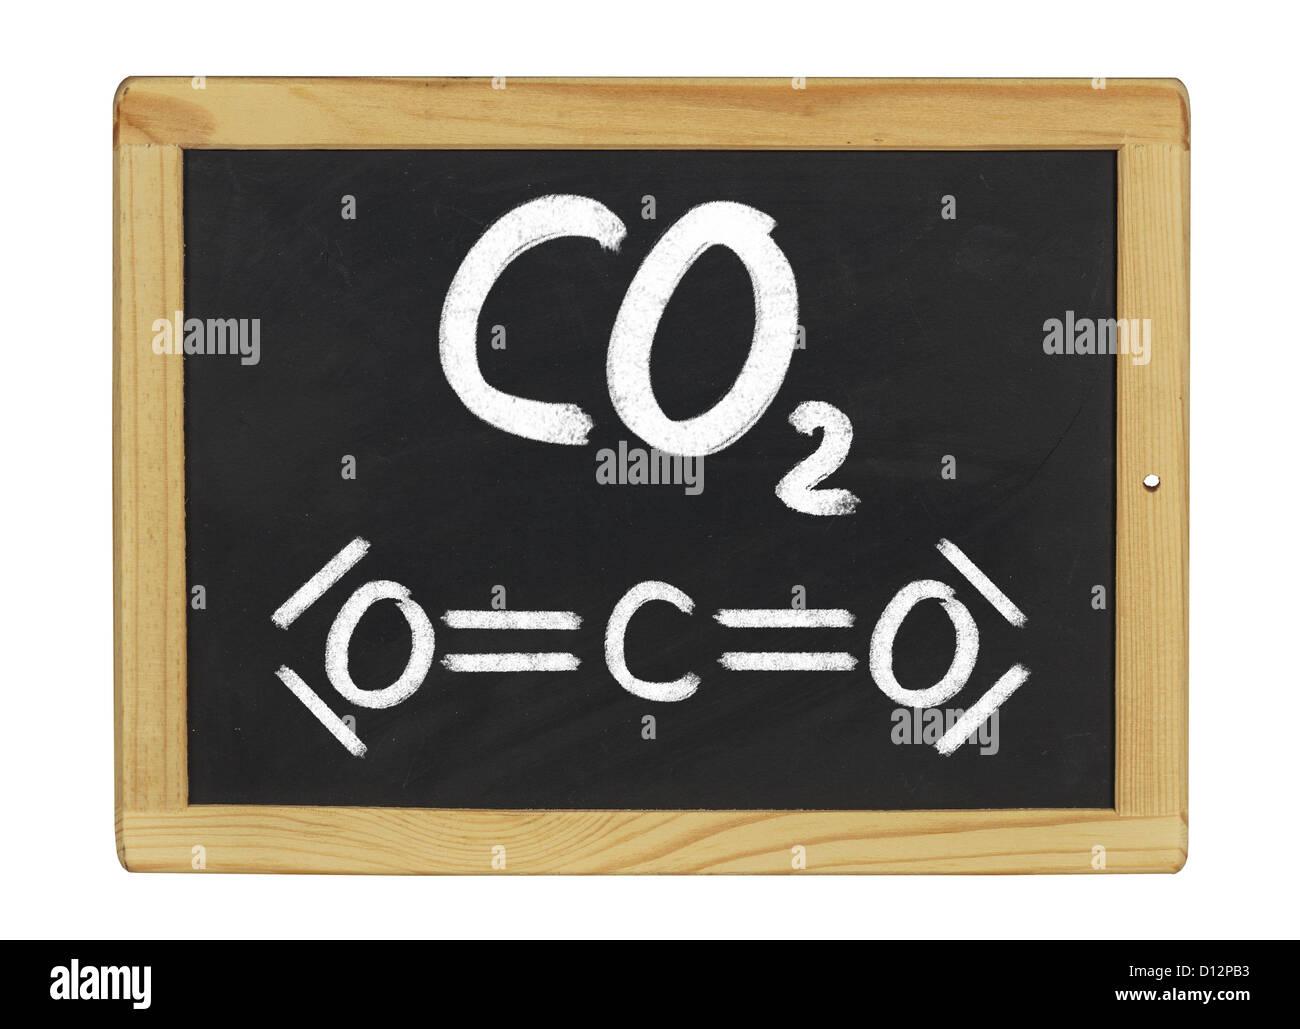 chemical formula of carbon dioxide on a blackboard - Stock Image